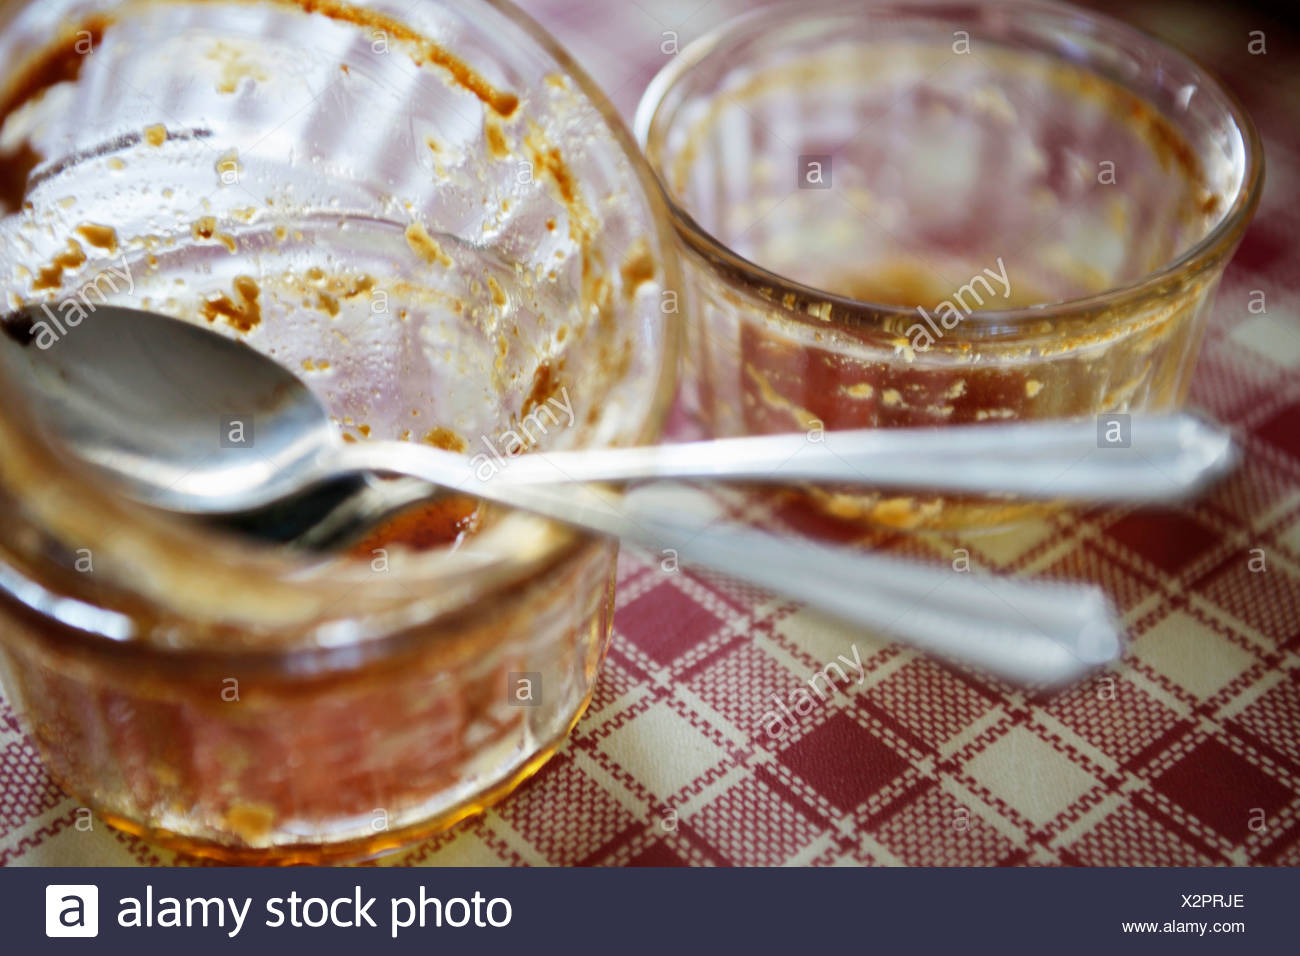 Finished ramekins of Crèmes brûlées - Stock Image